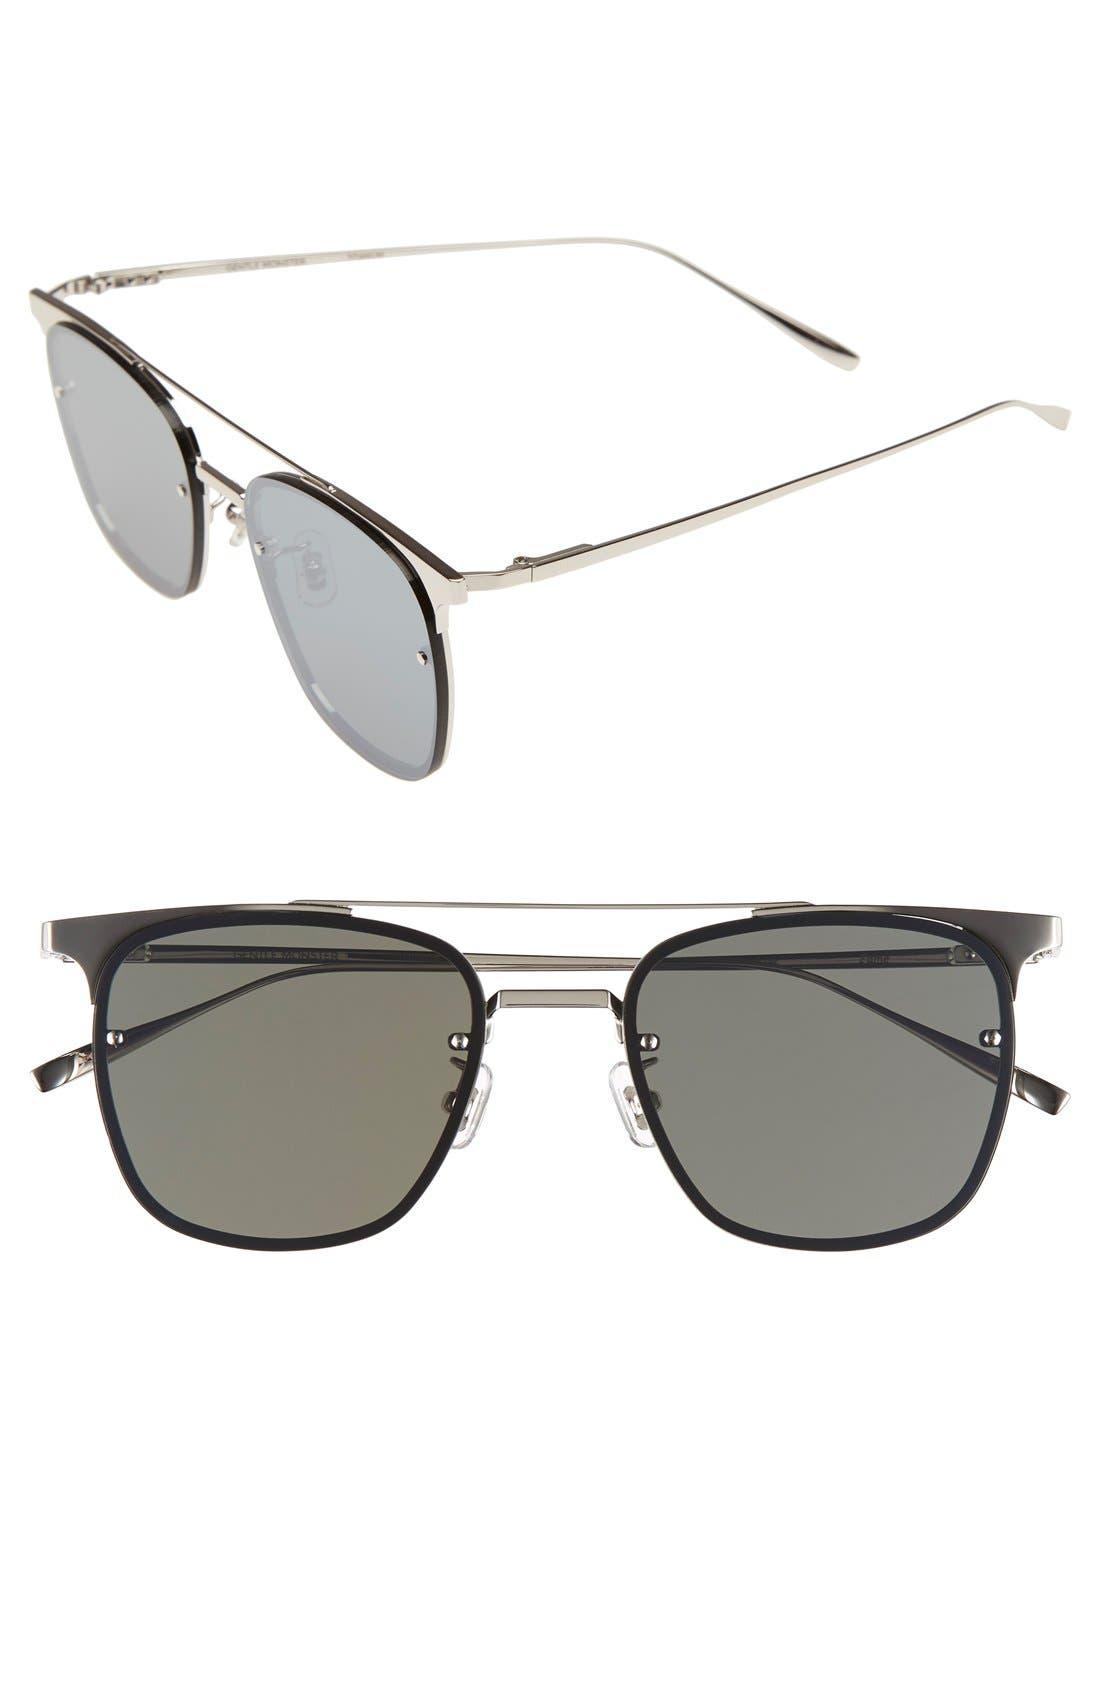 GENTLE MONSTER 'Fame' 55mm Retro Sunglasses, Main, color, 040